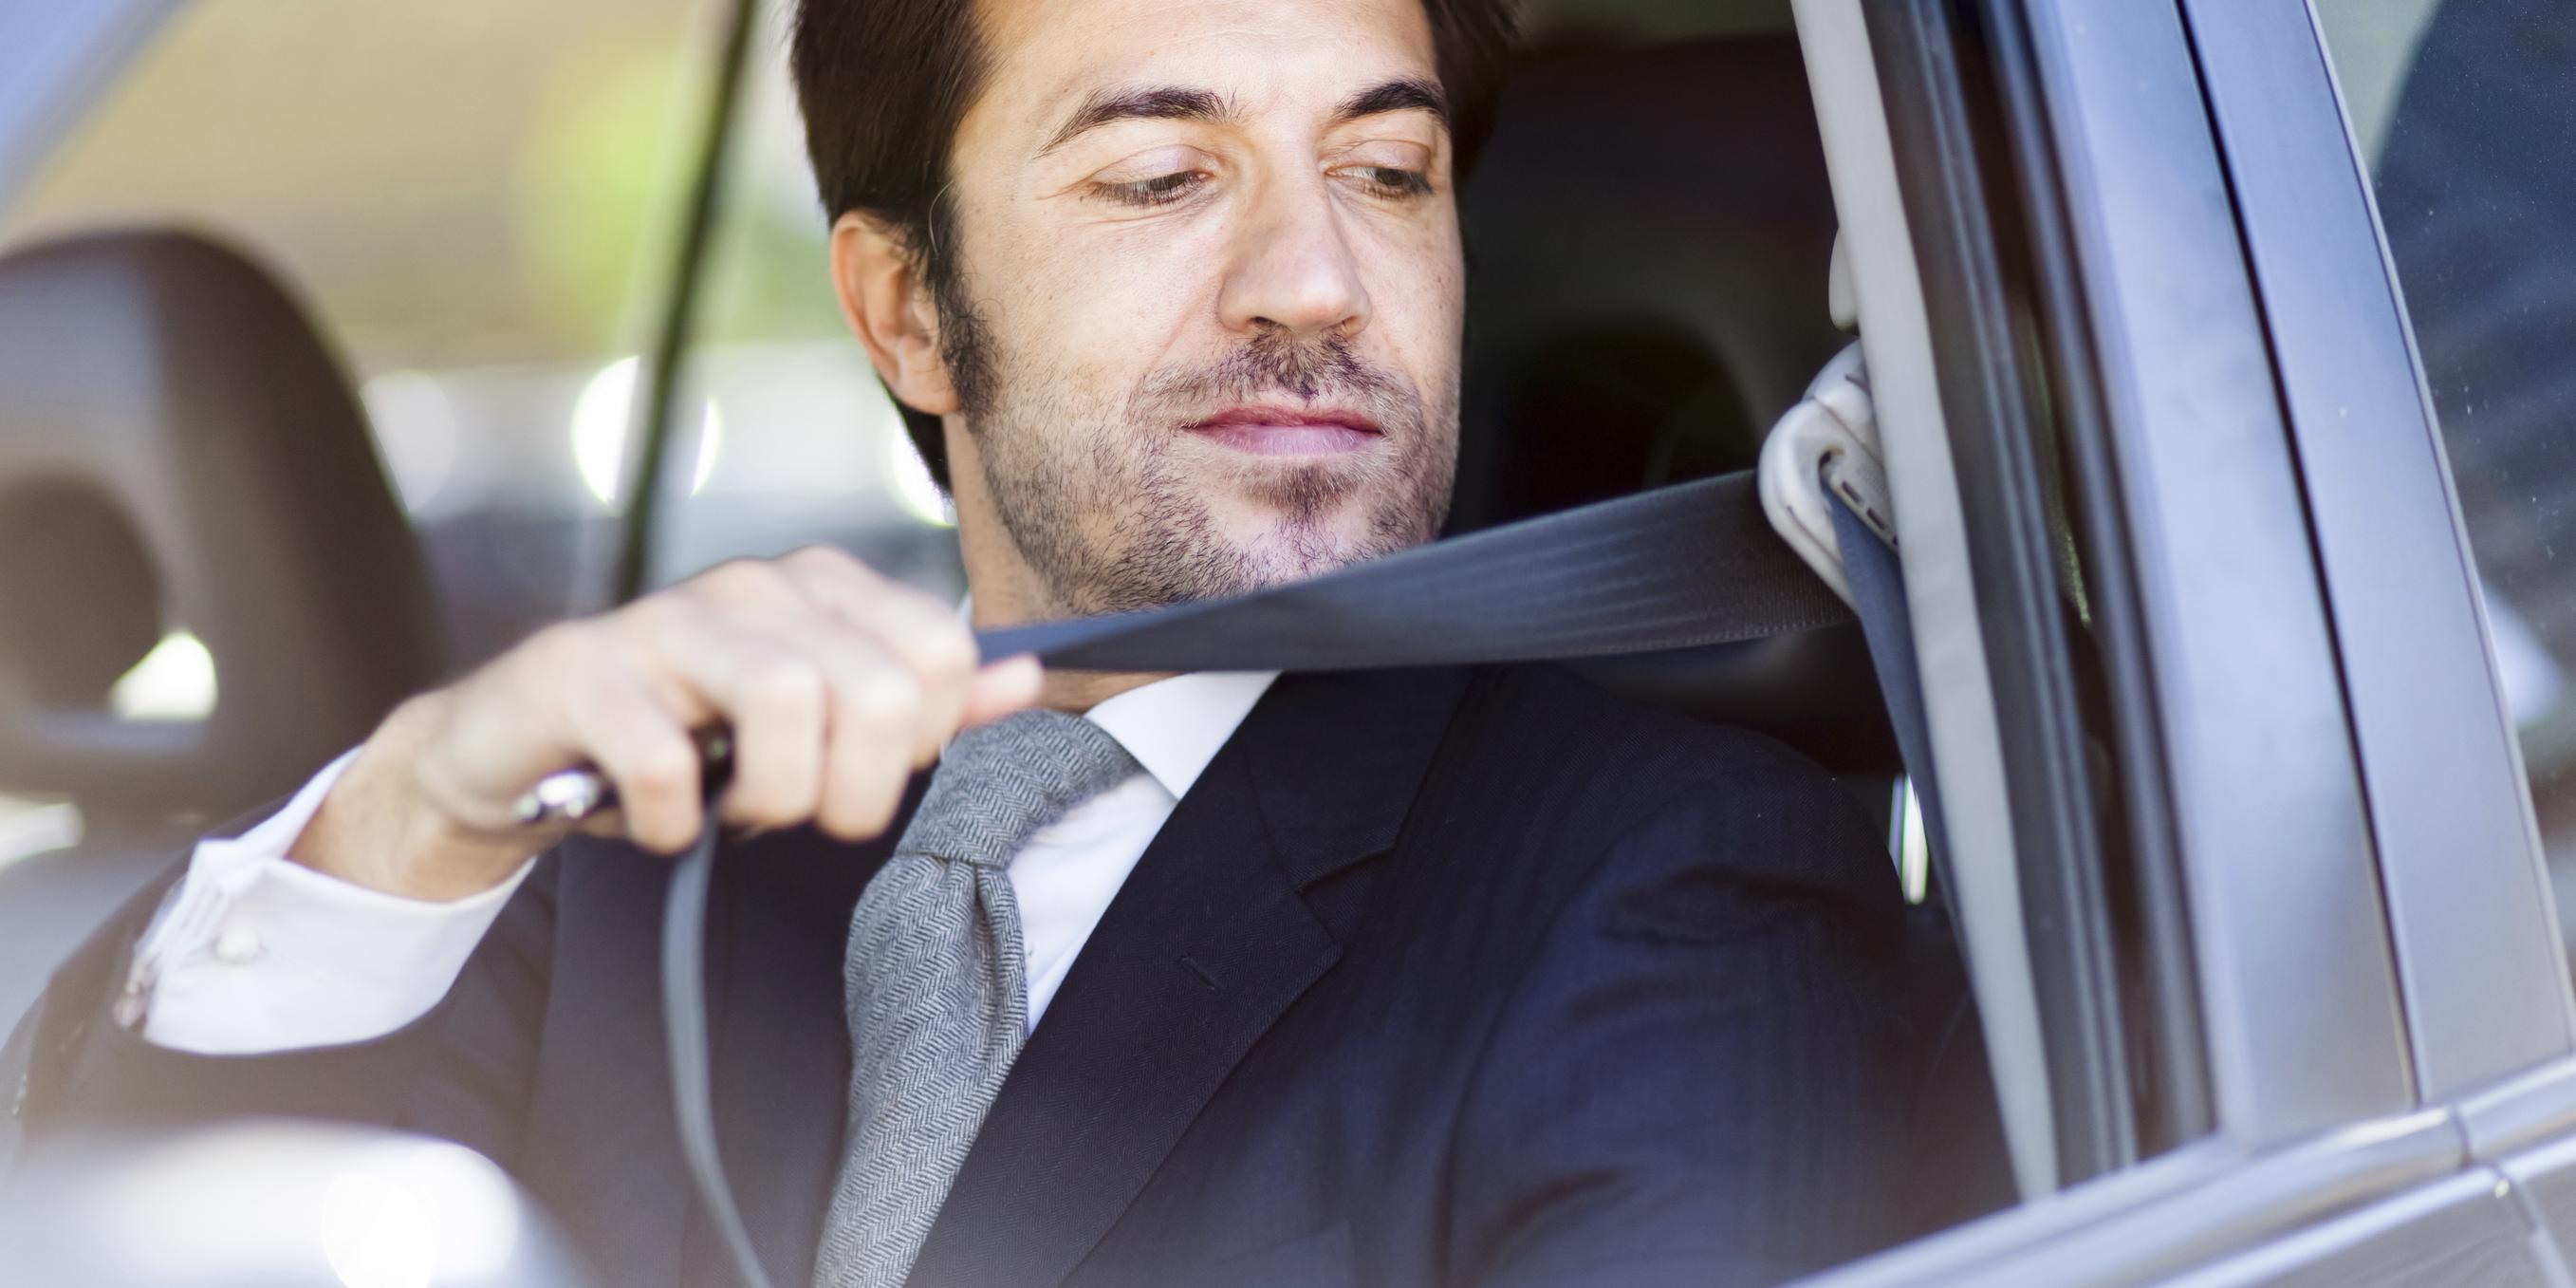 ceinture sécurité